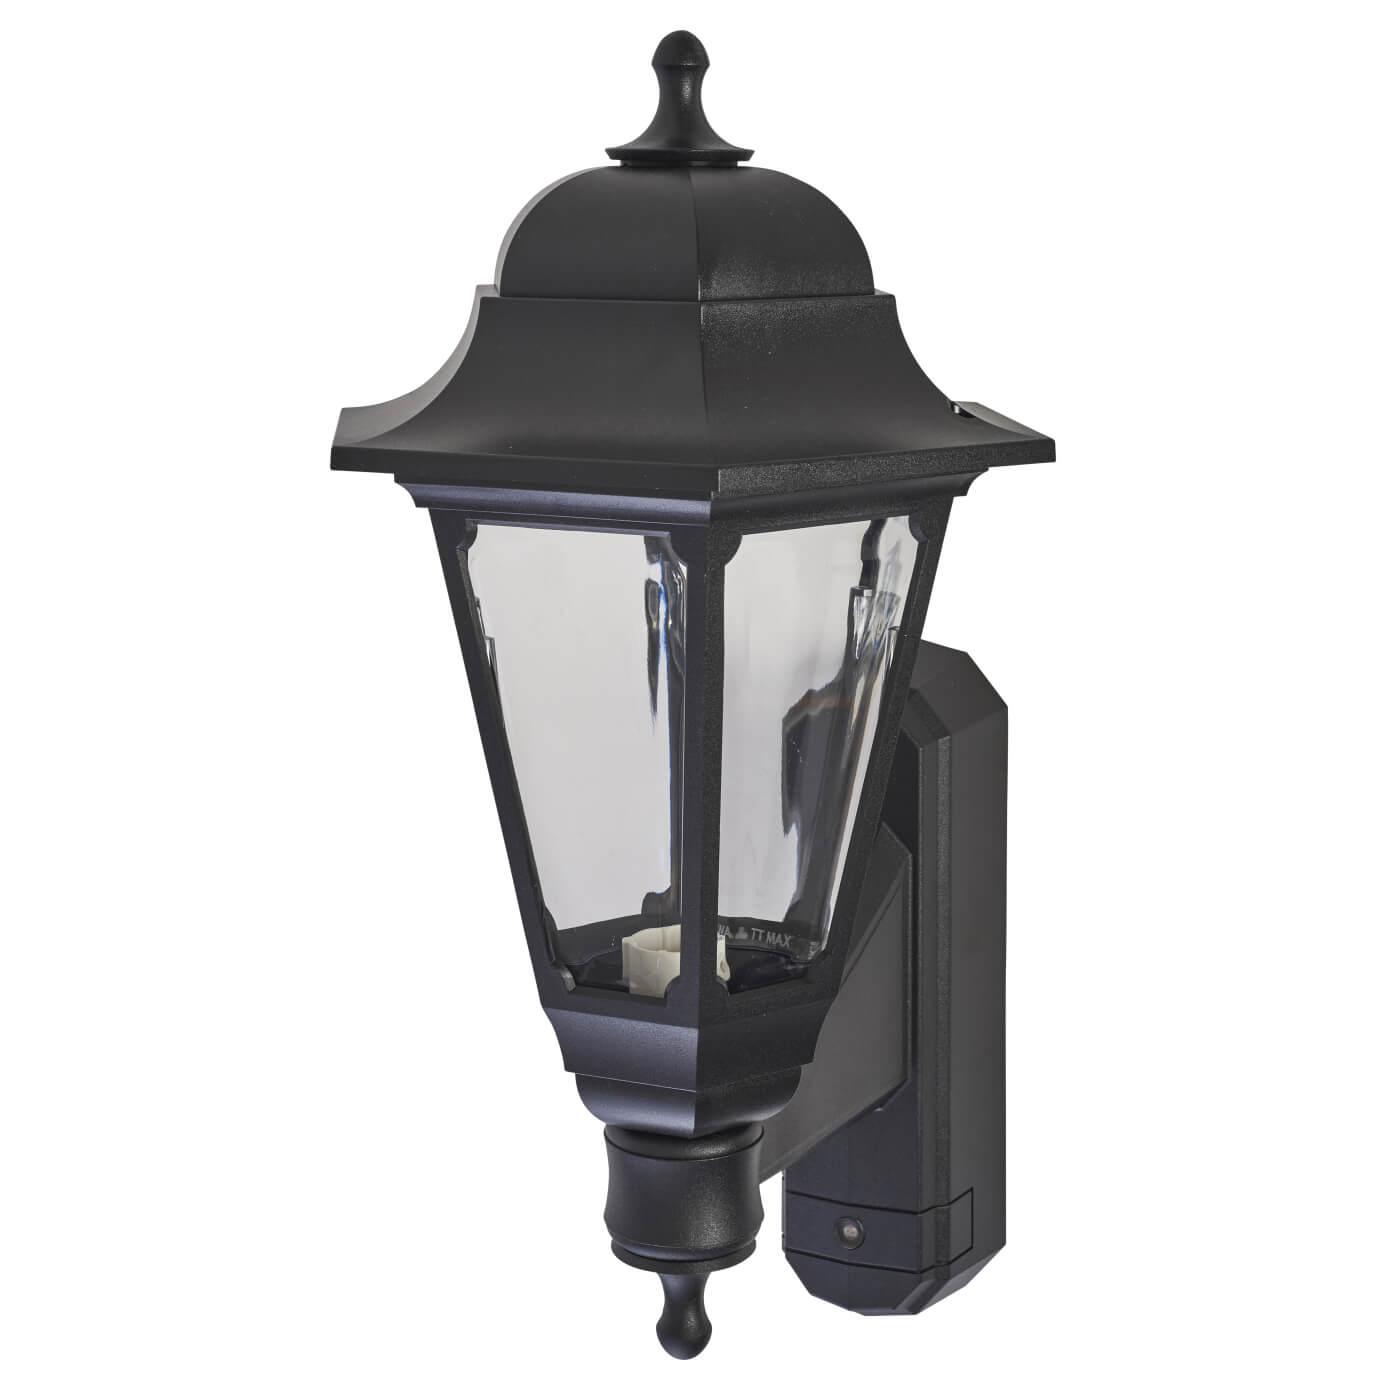 Asd Coach Pedestal Lantern: ASD Lighting Coach Lantern With Photocell